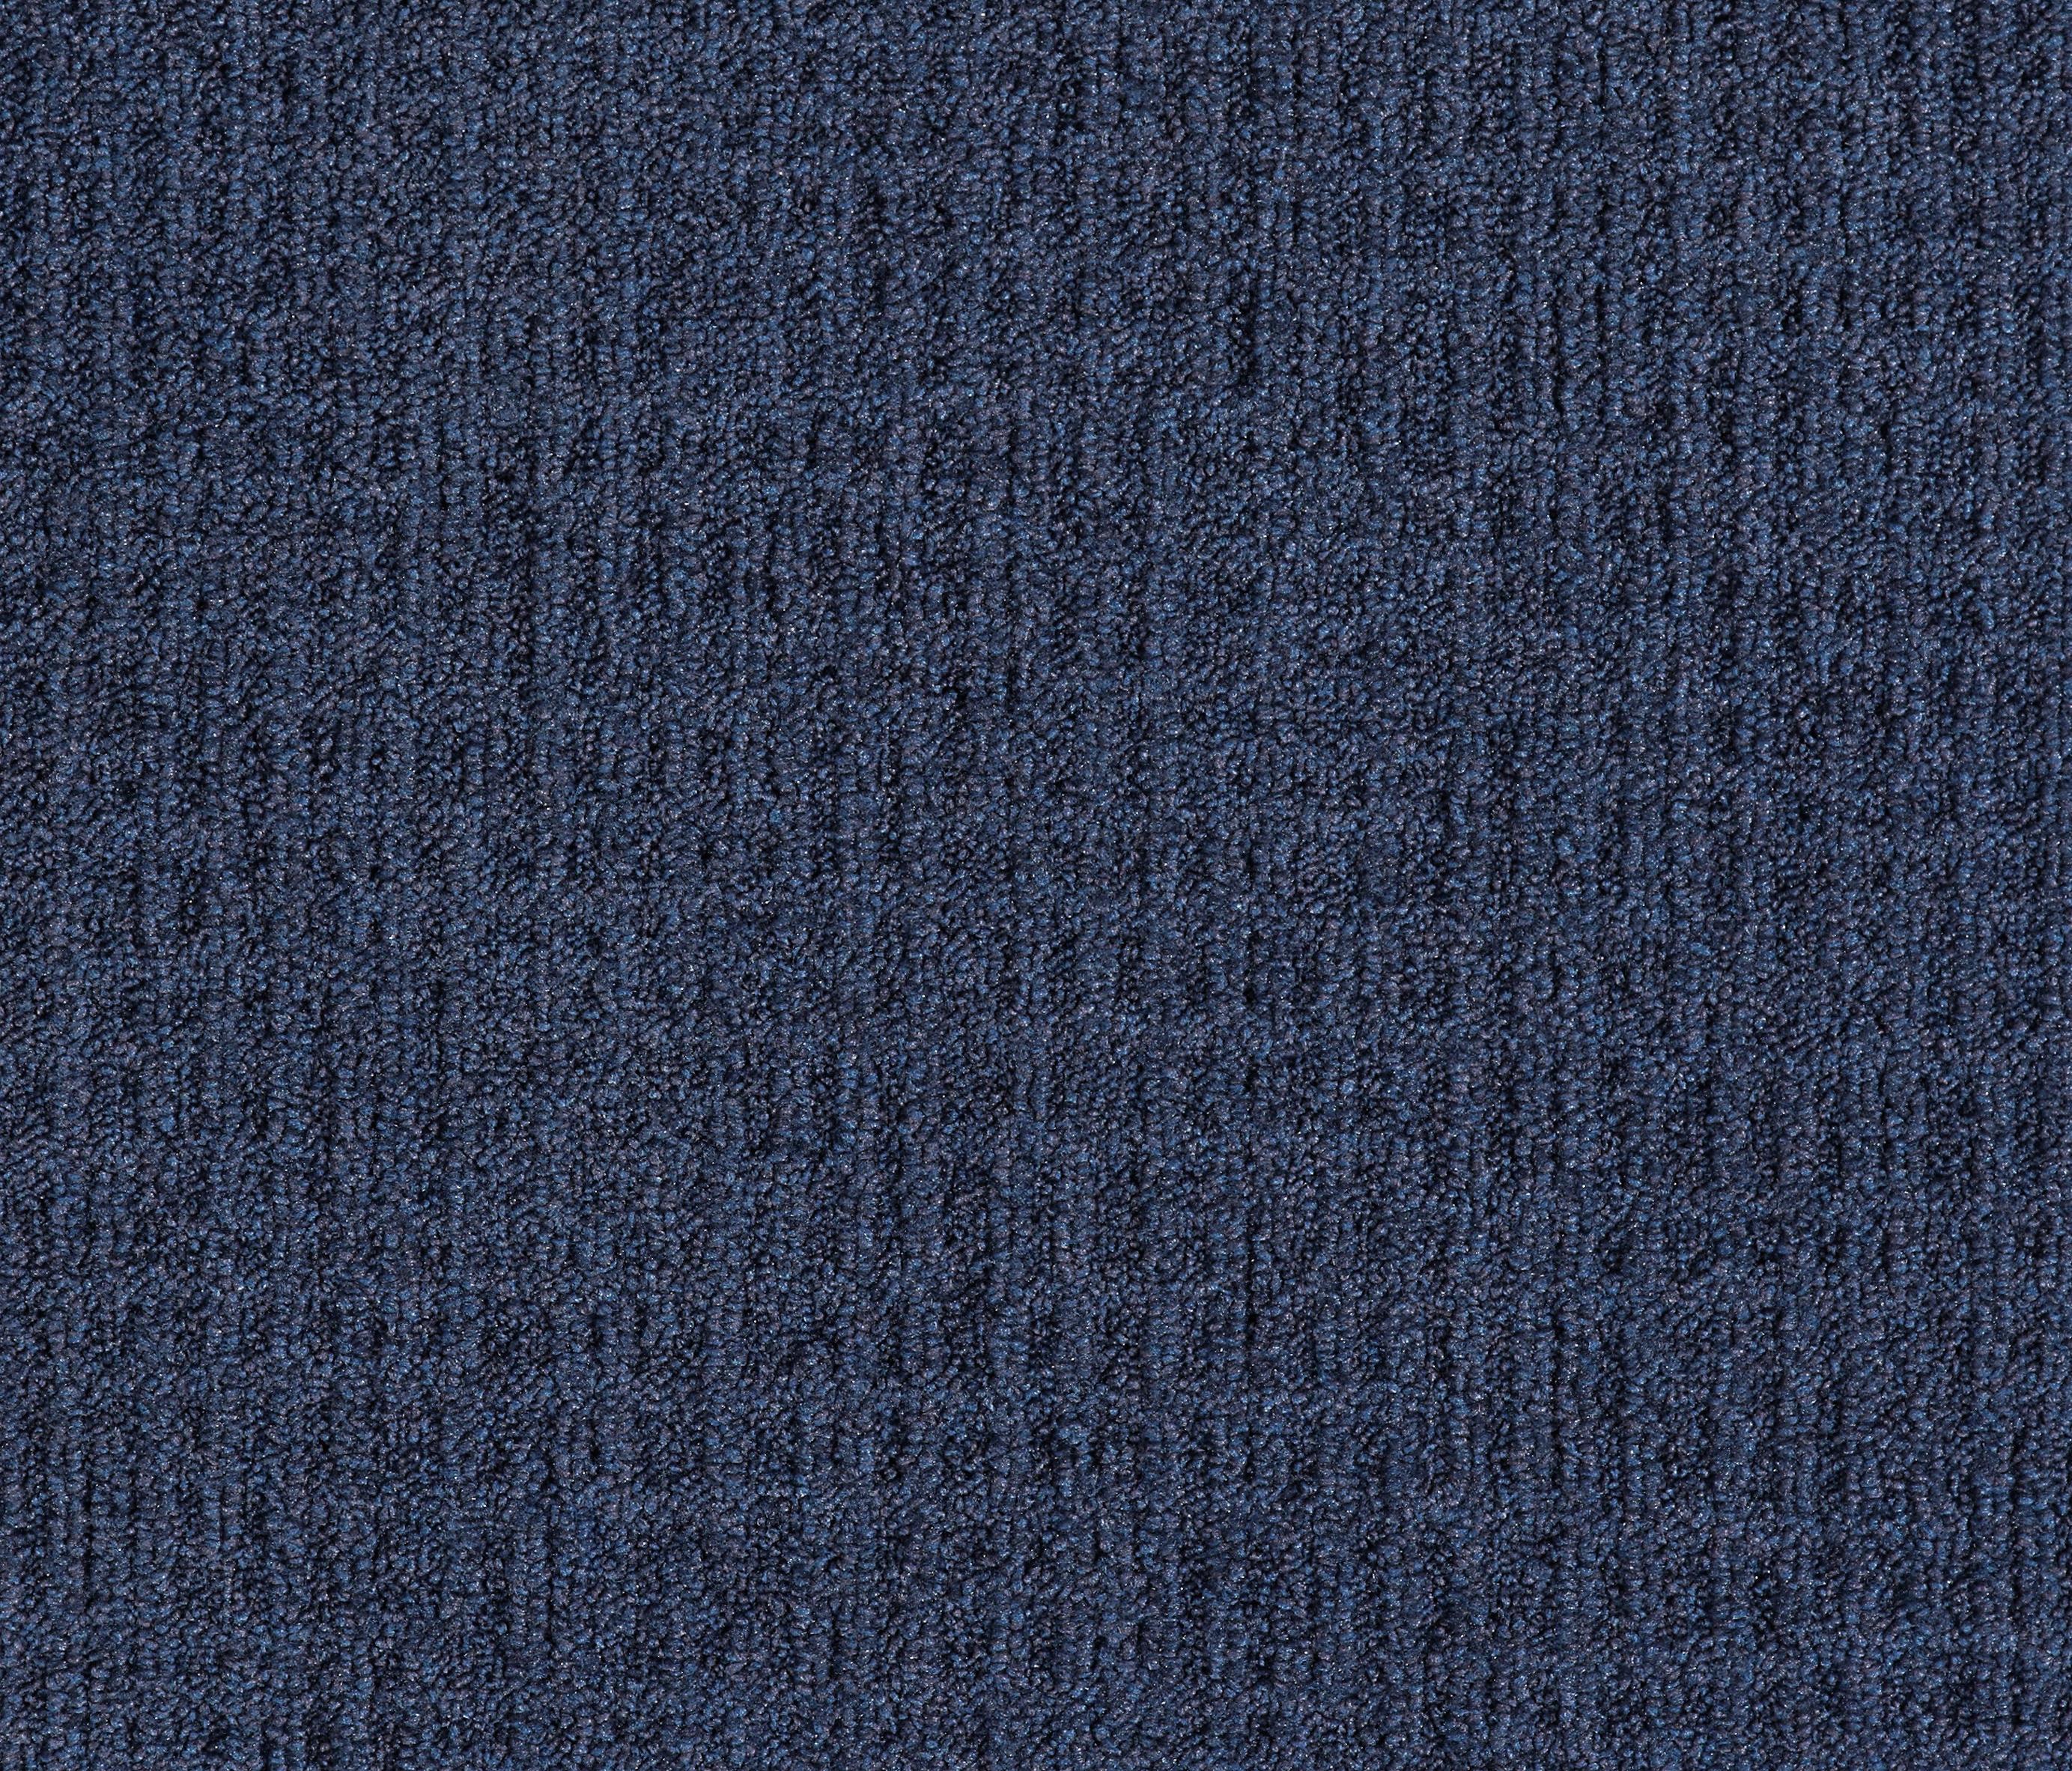 Monochrome 346707 Flag Blue Carpet Tiles From Interface